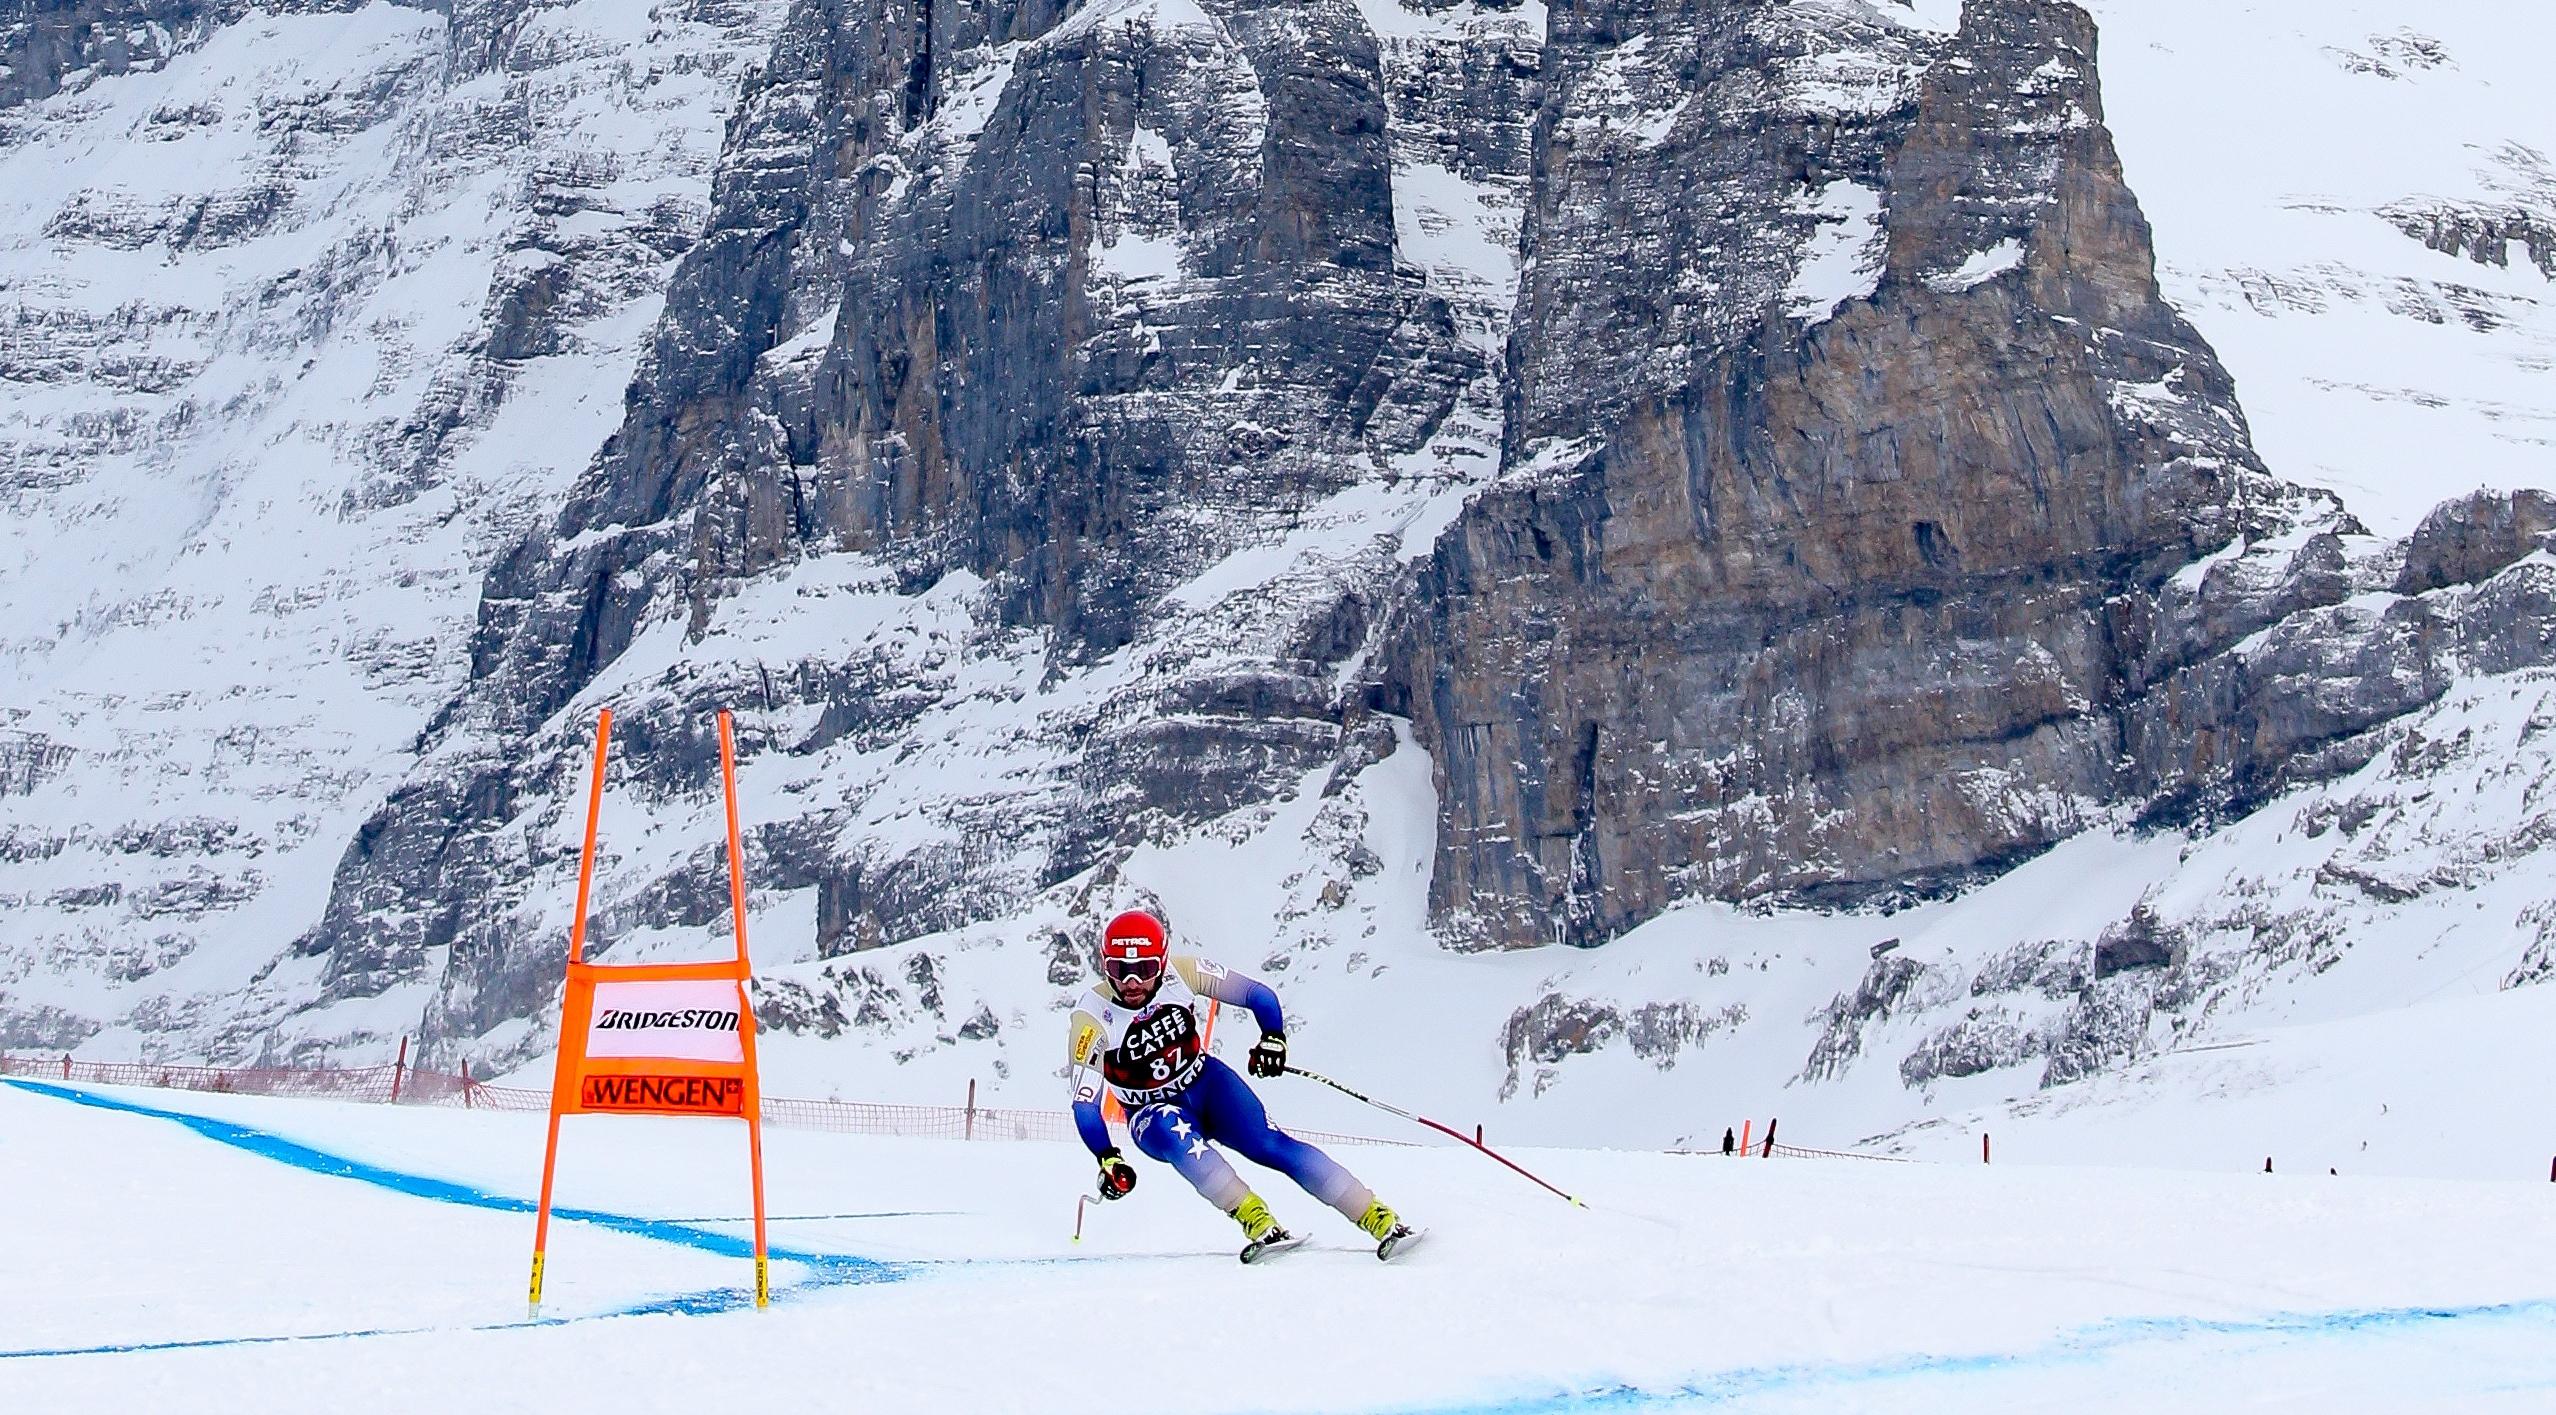 WENGEN,SWITZERLAND,10.JAN.18 - ALPINE SKIING - FIS World Cup, Downhill Training, Men. Image Shows Albin Tahiri (KOS). Photo: GEPA Pictures/ Mario Kneisl